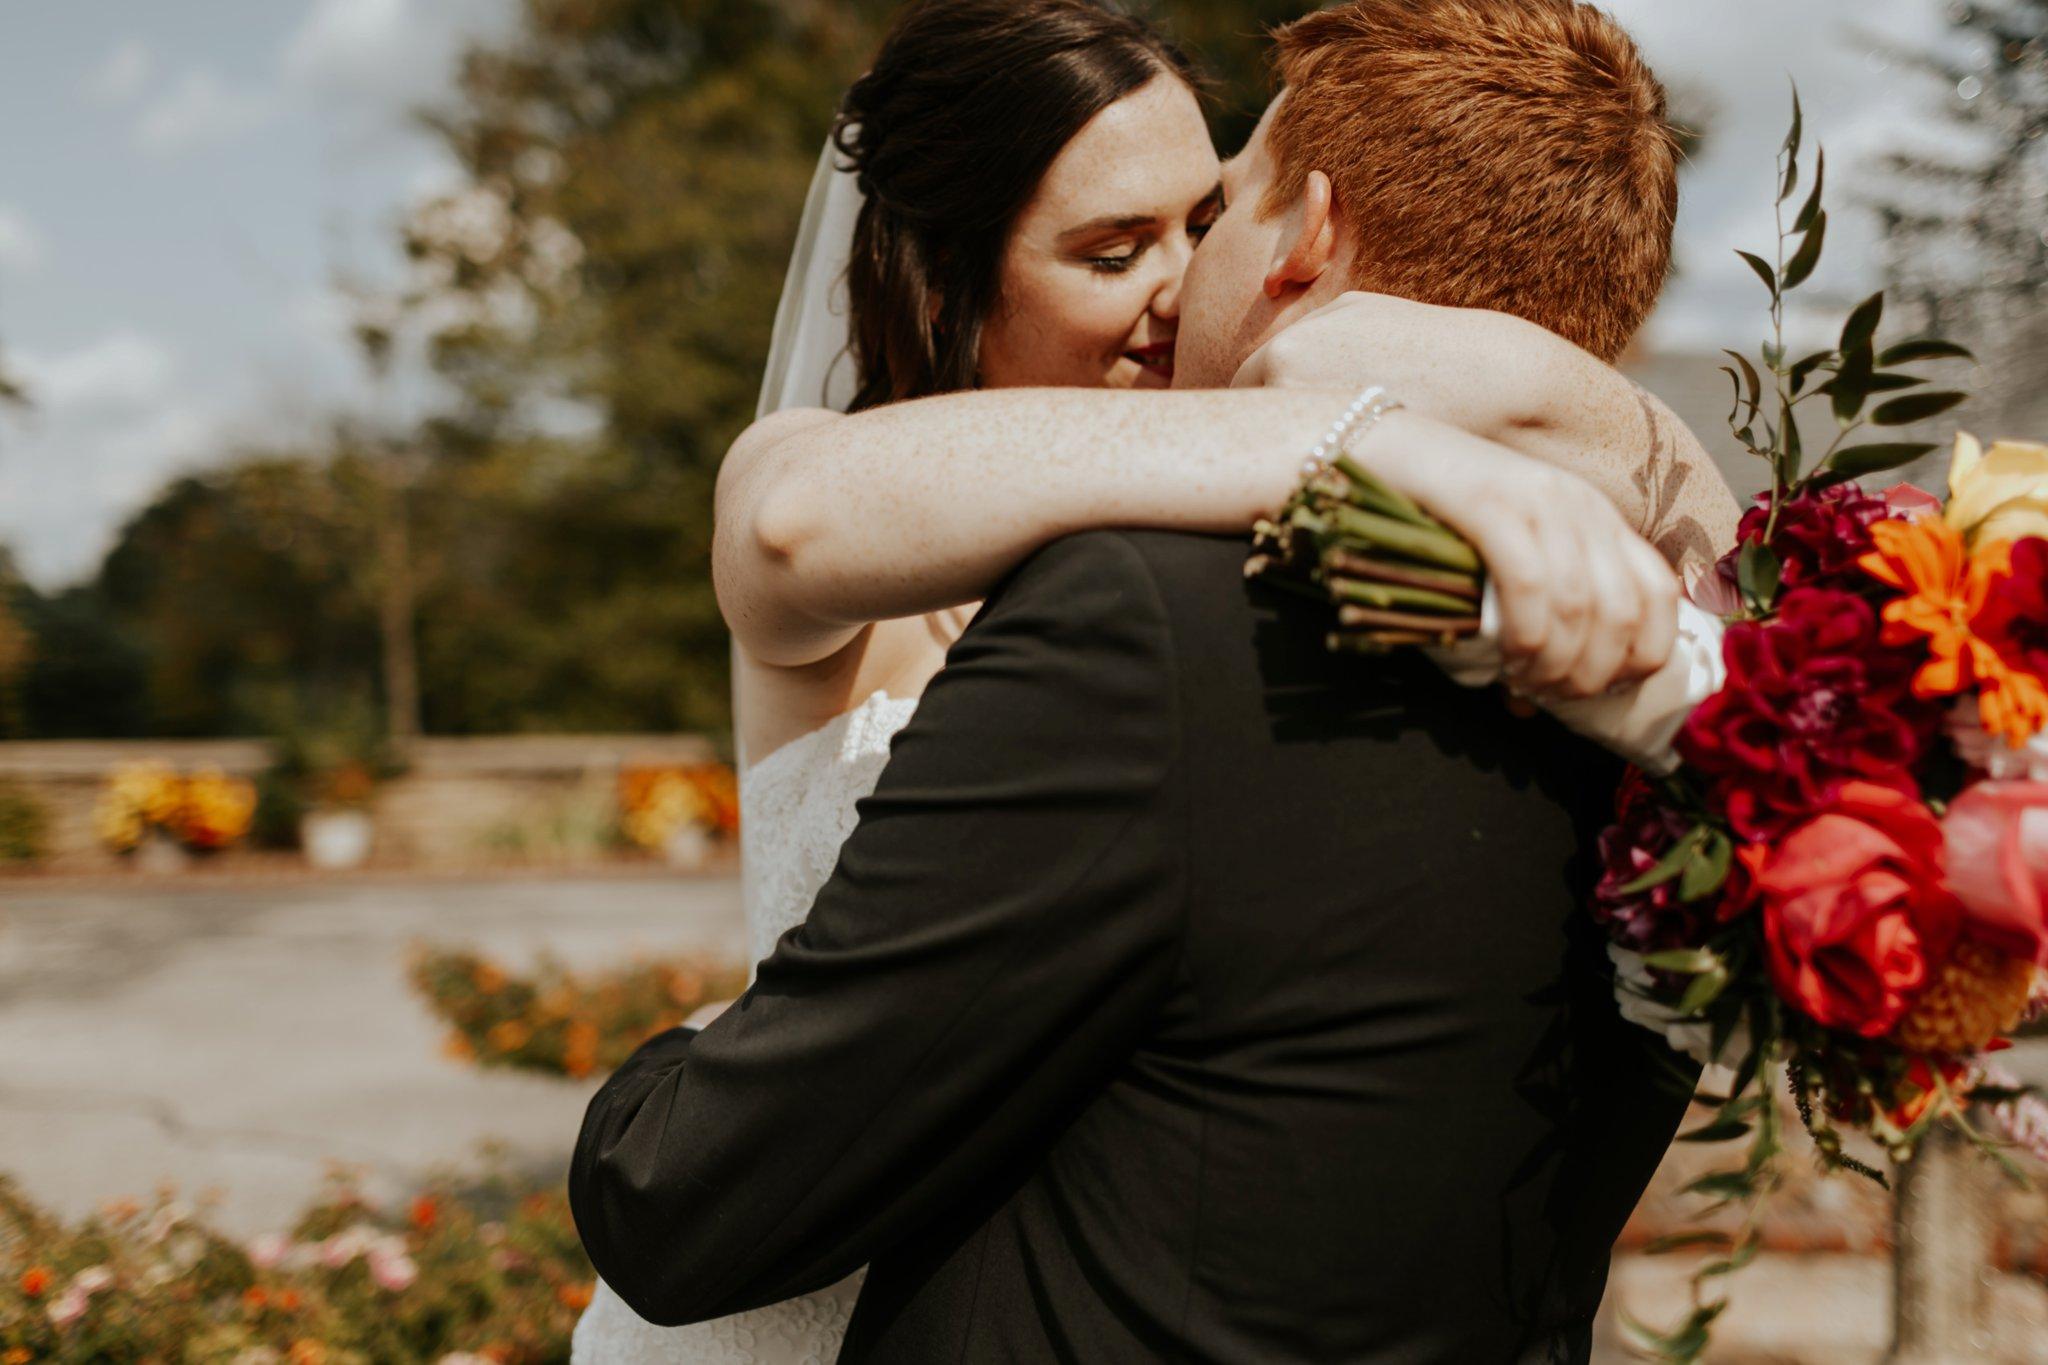 17-09-15 Lindsey and Brandon Wedding Edited-345_WEB.jpg